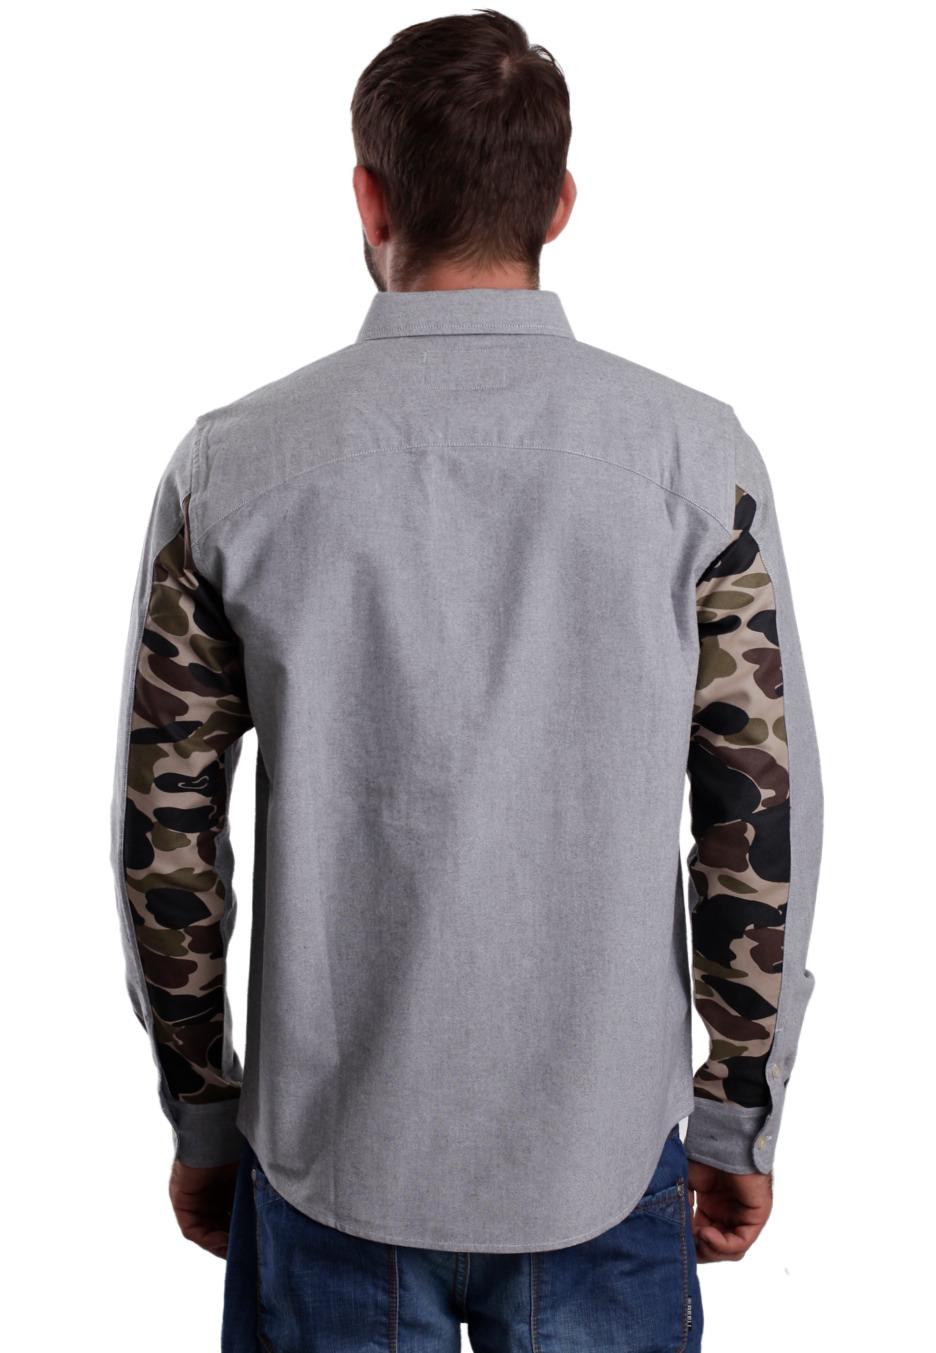 ... Carhartt WIP - Raymond Black/Camo Isle Rigid - Shirt